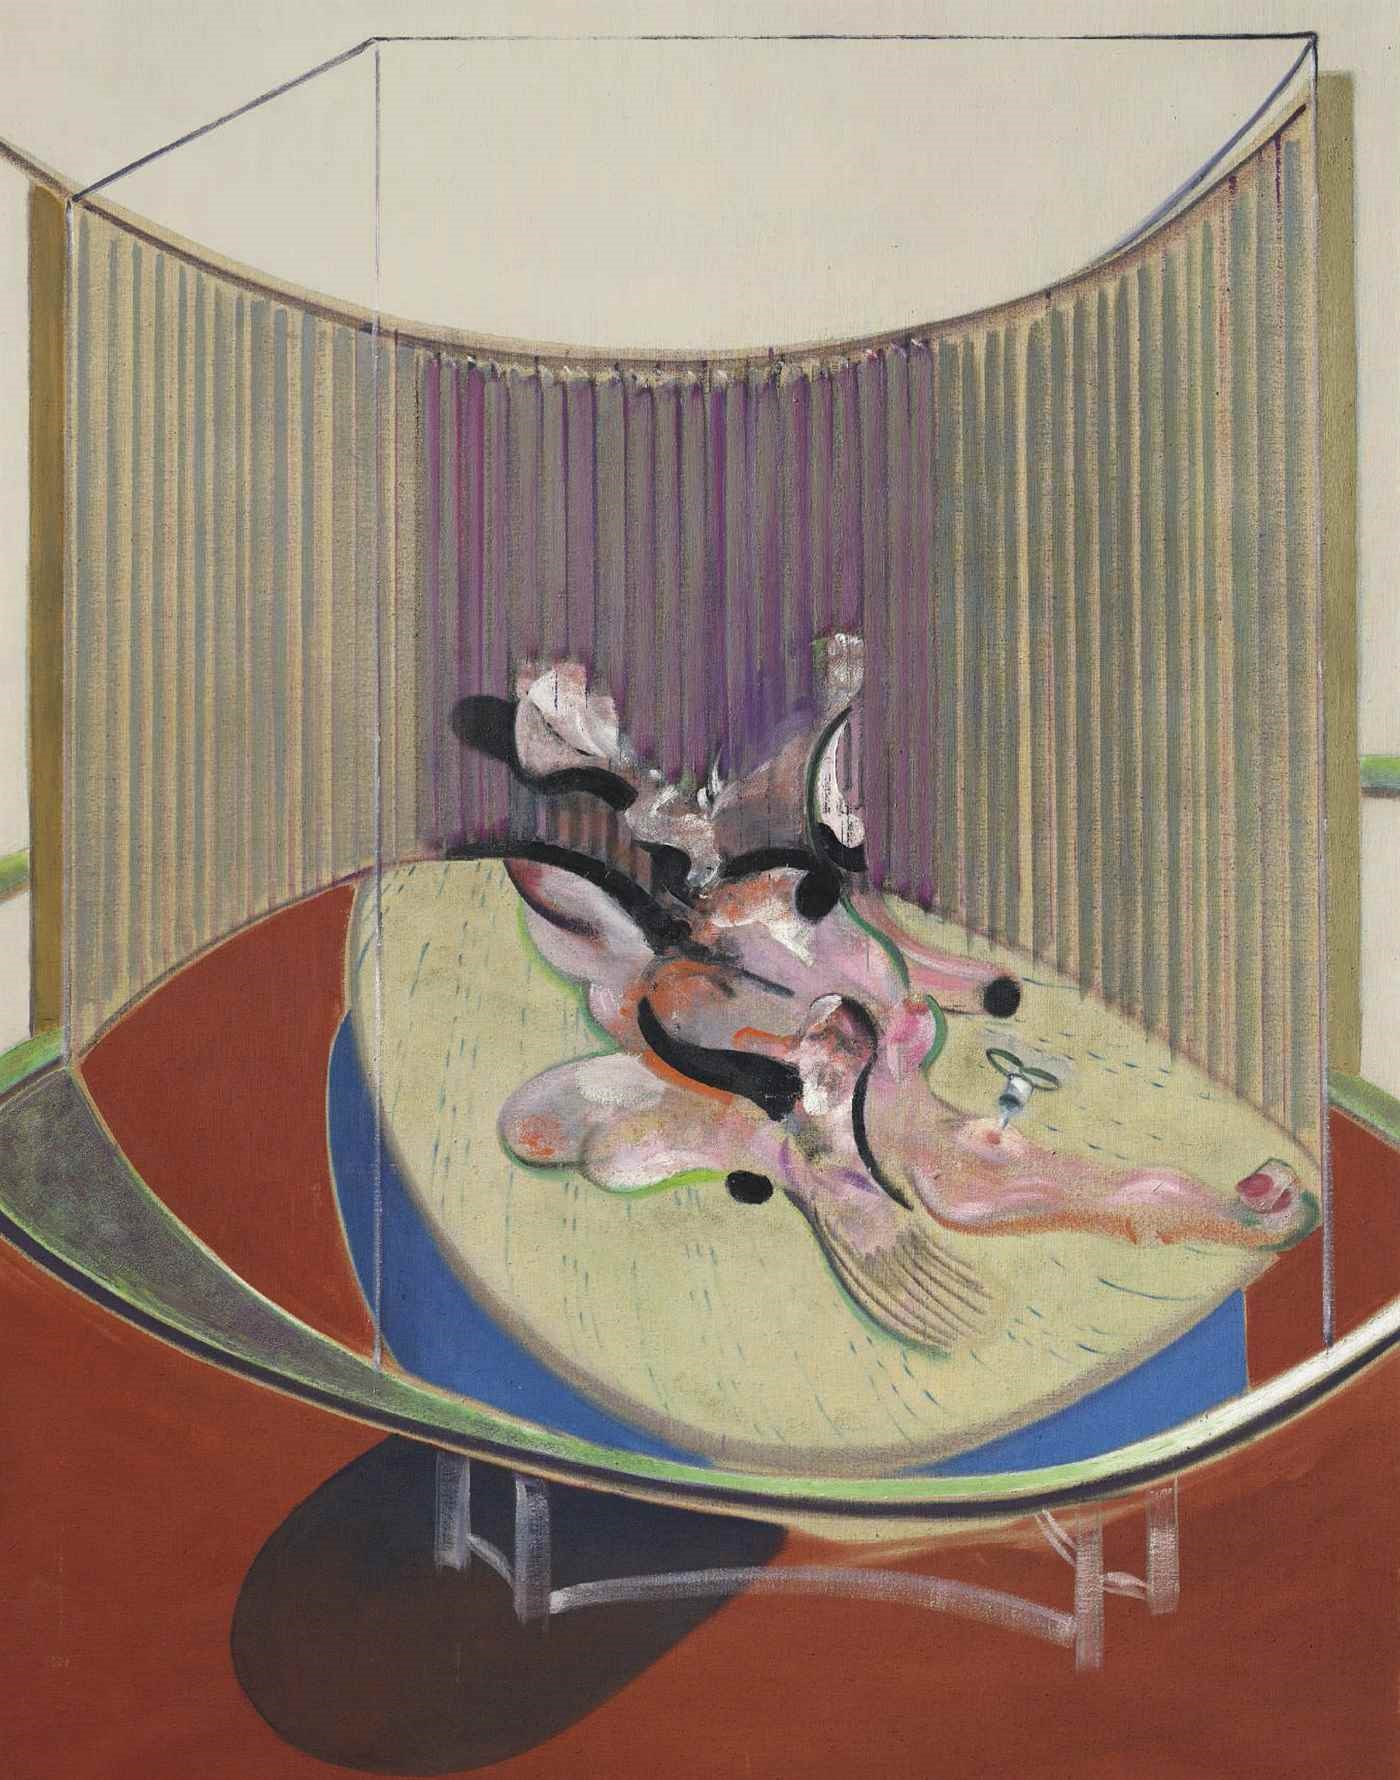 Defining British Art Evening S auction at Christies